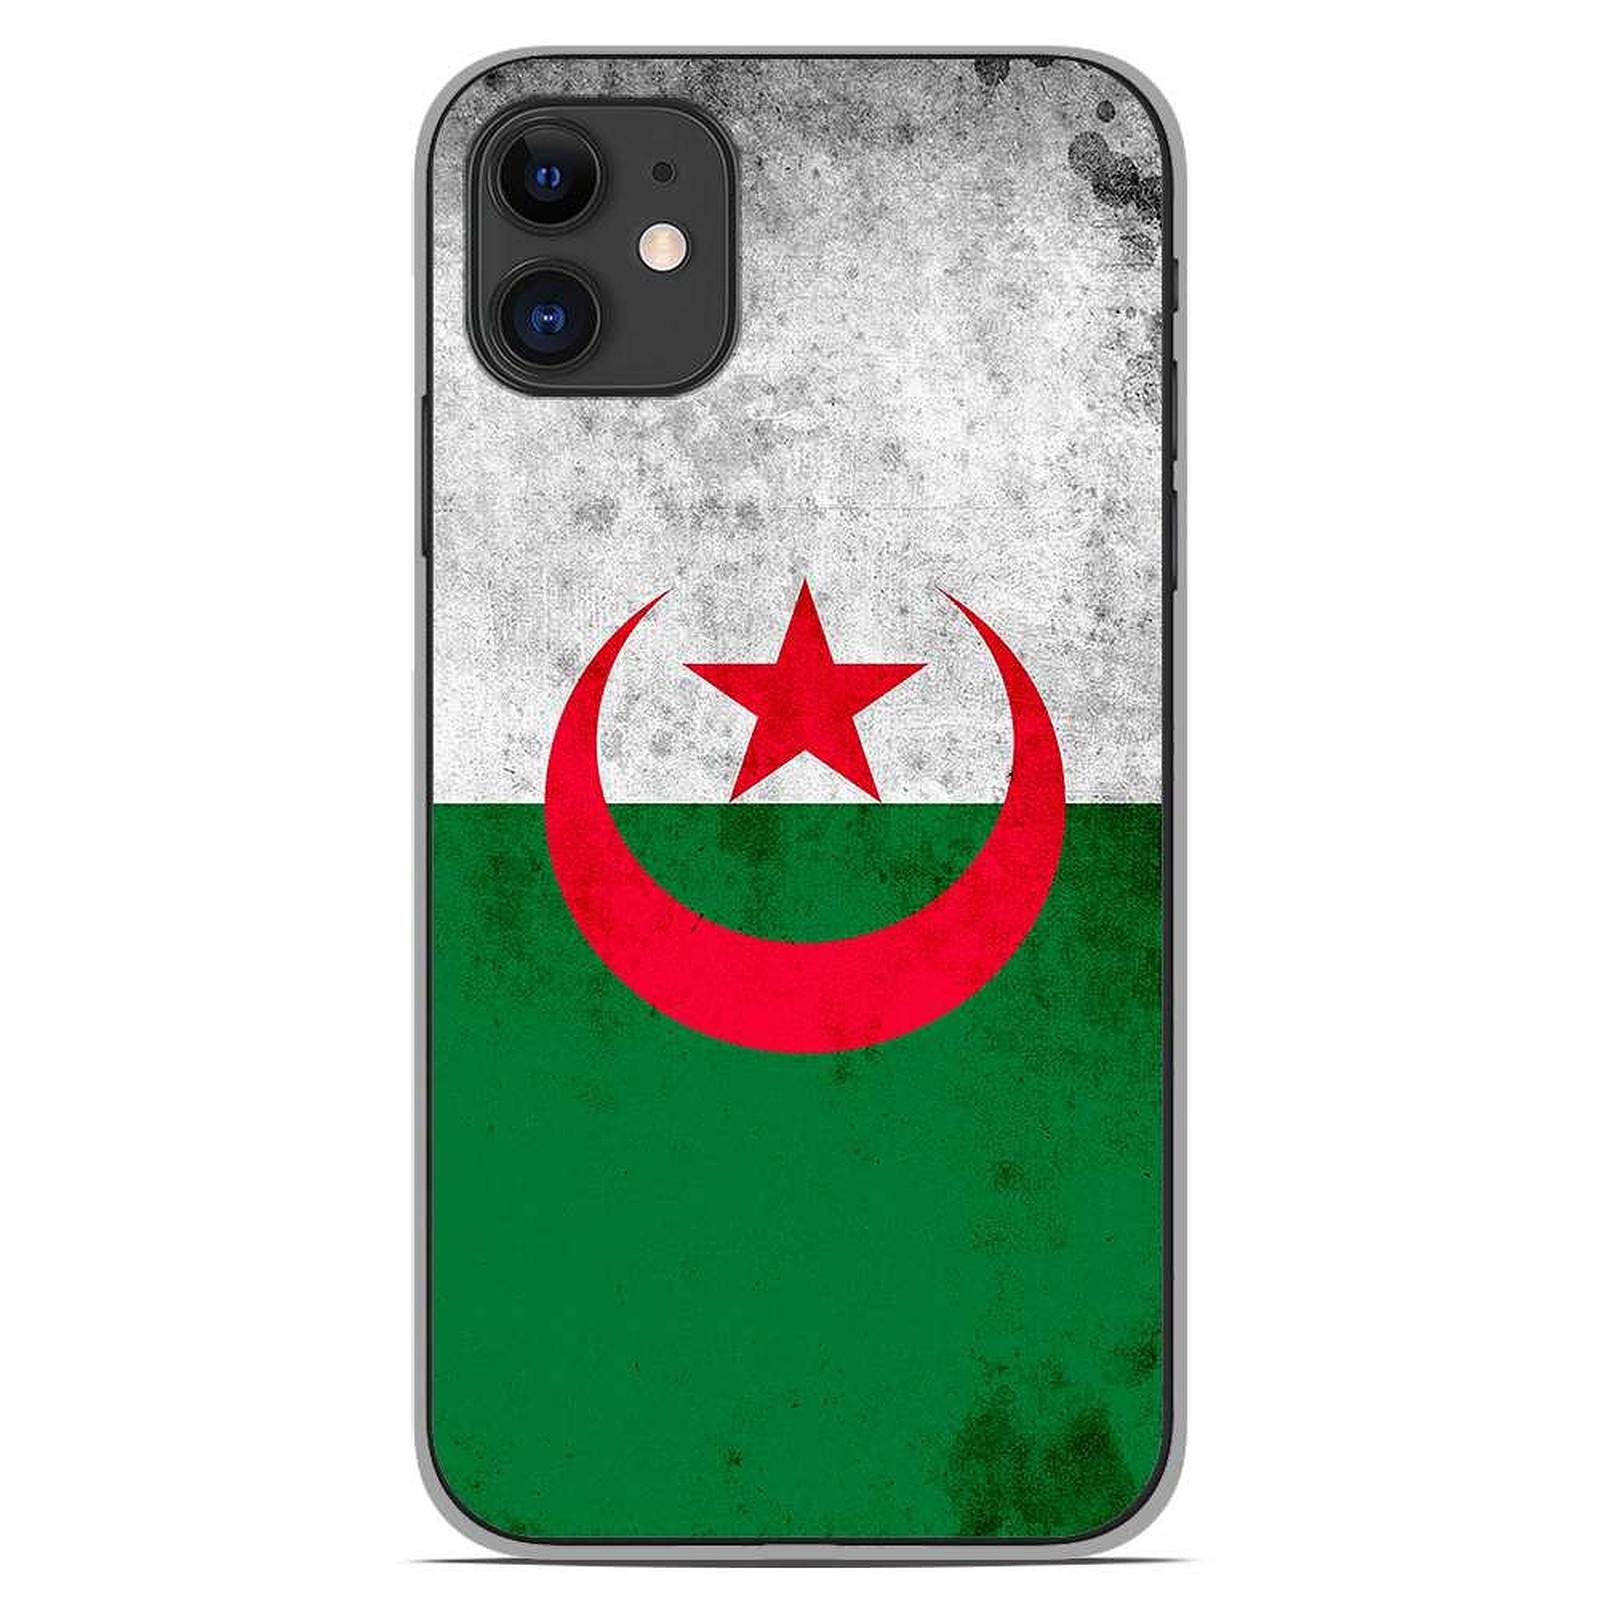 1001 Coques Coque silicone gel Apple iPhone 11 motif Drapeau Algérie